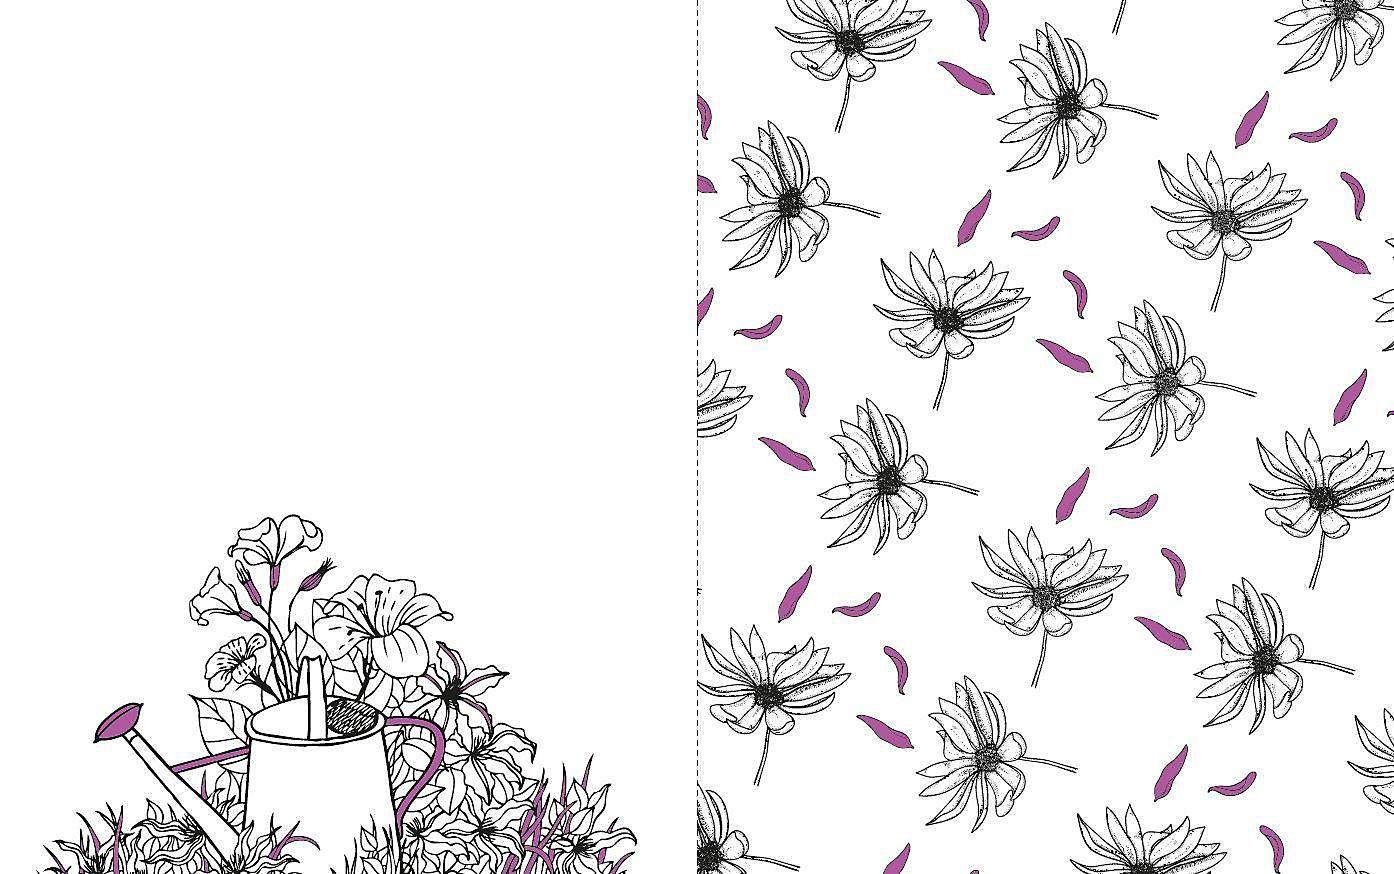 Kreatives Ausmalen Blumen Buch Bei Weltbild Ch Online Bestellen